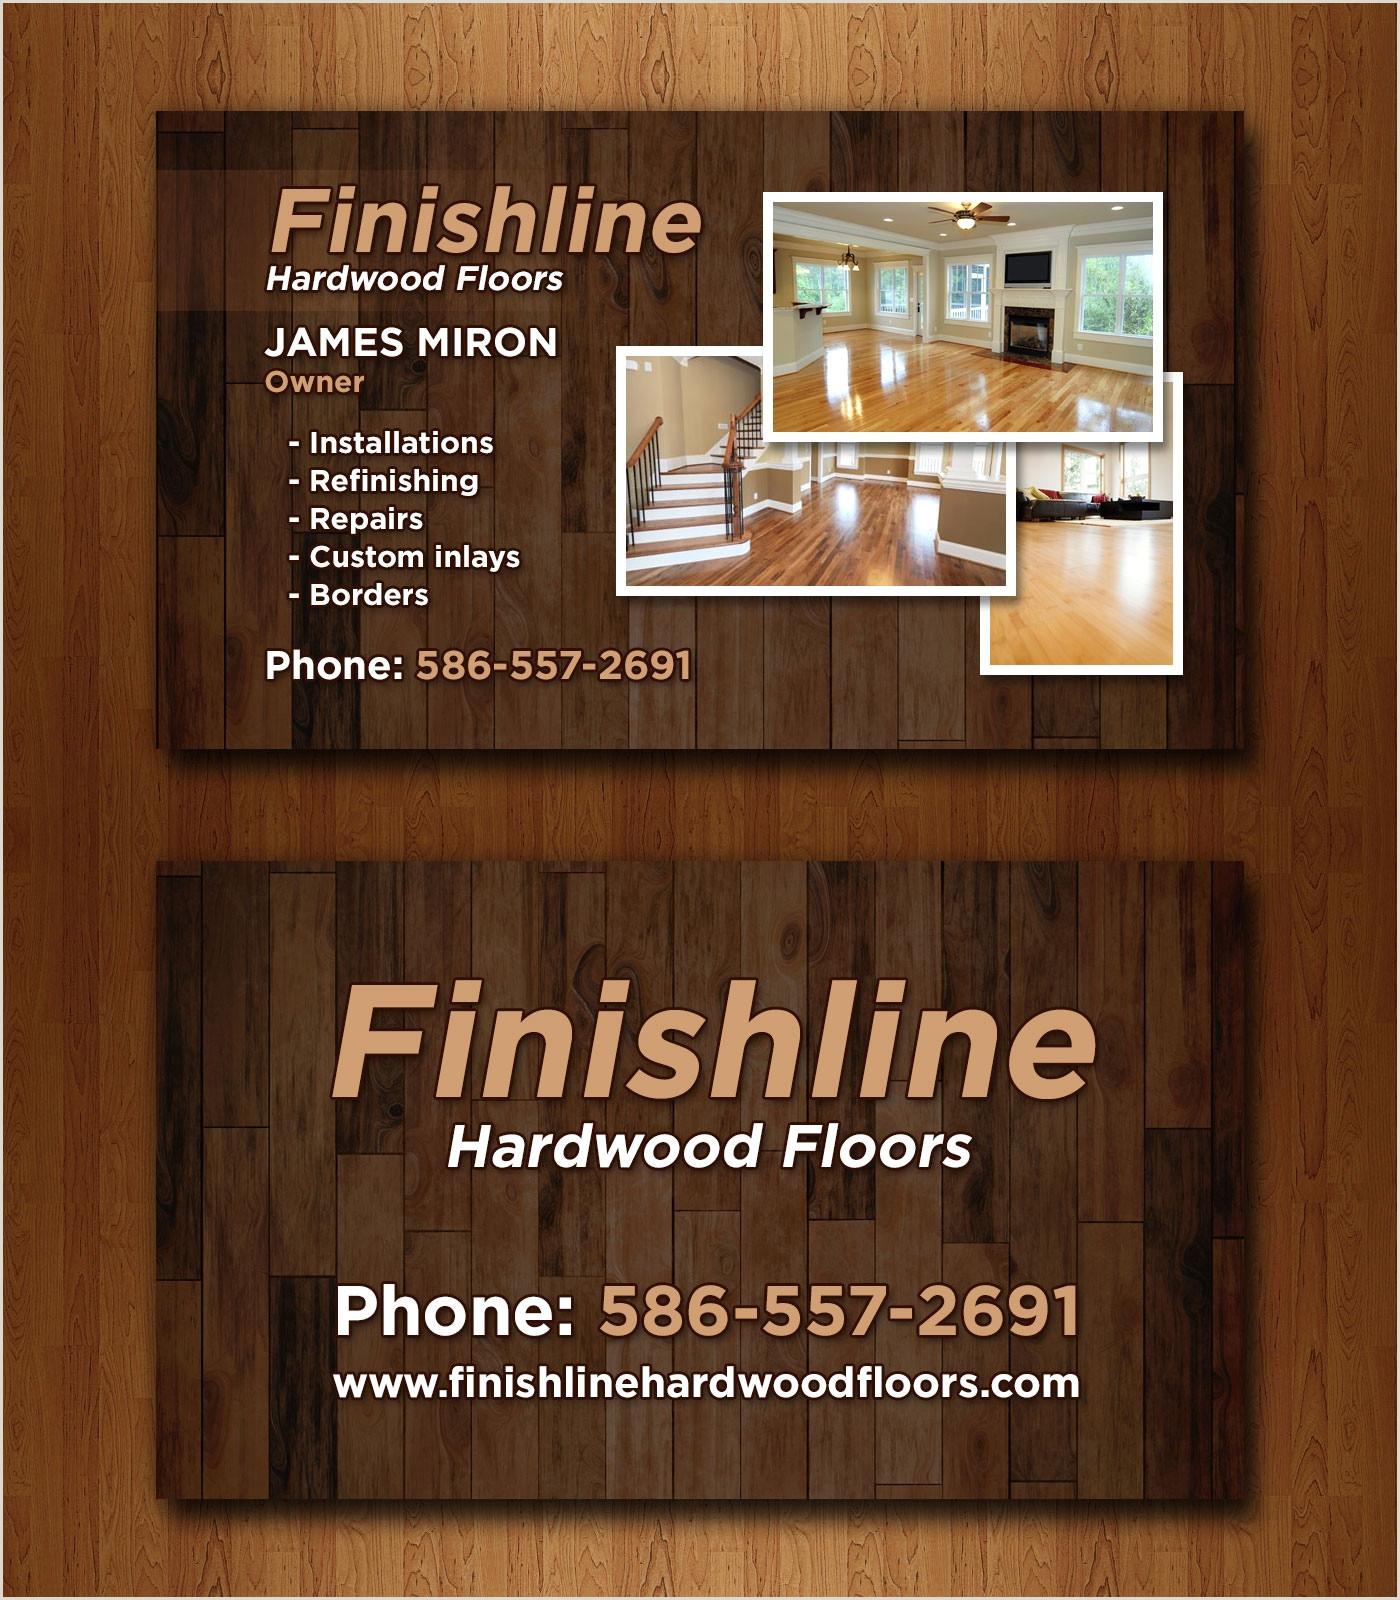 Creative Business Cards Templates 14 Popular Hardwood Flooring Business Card Template